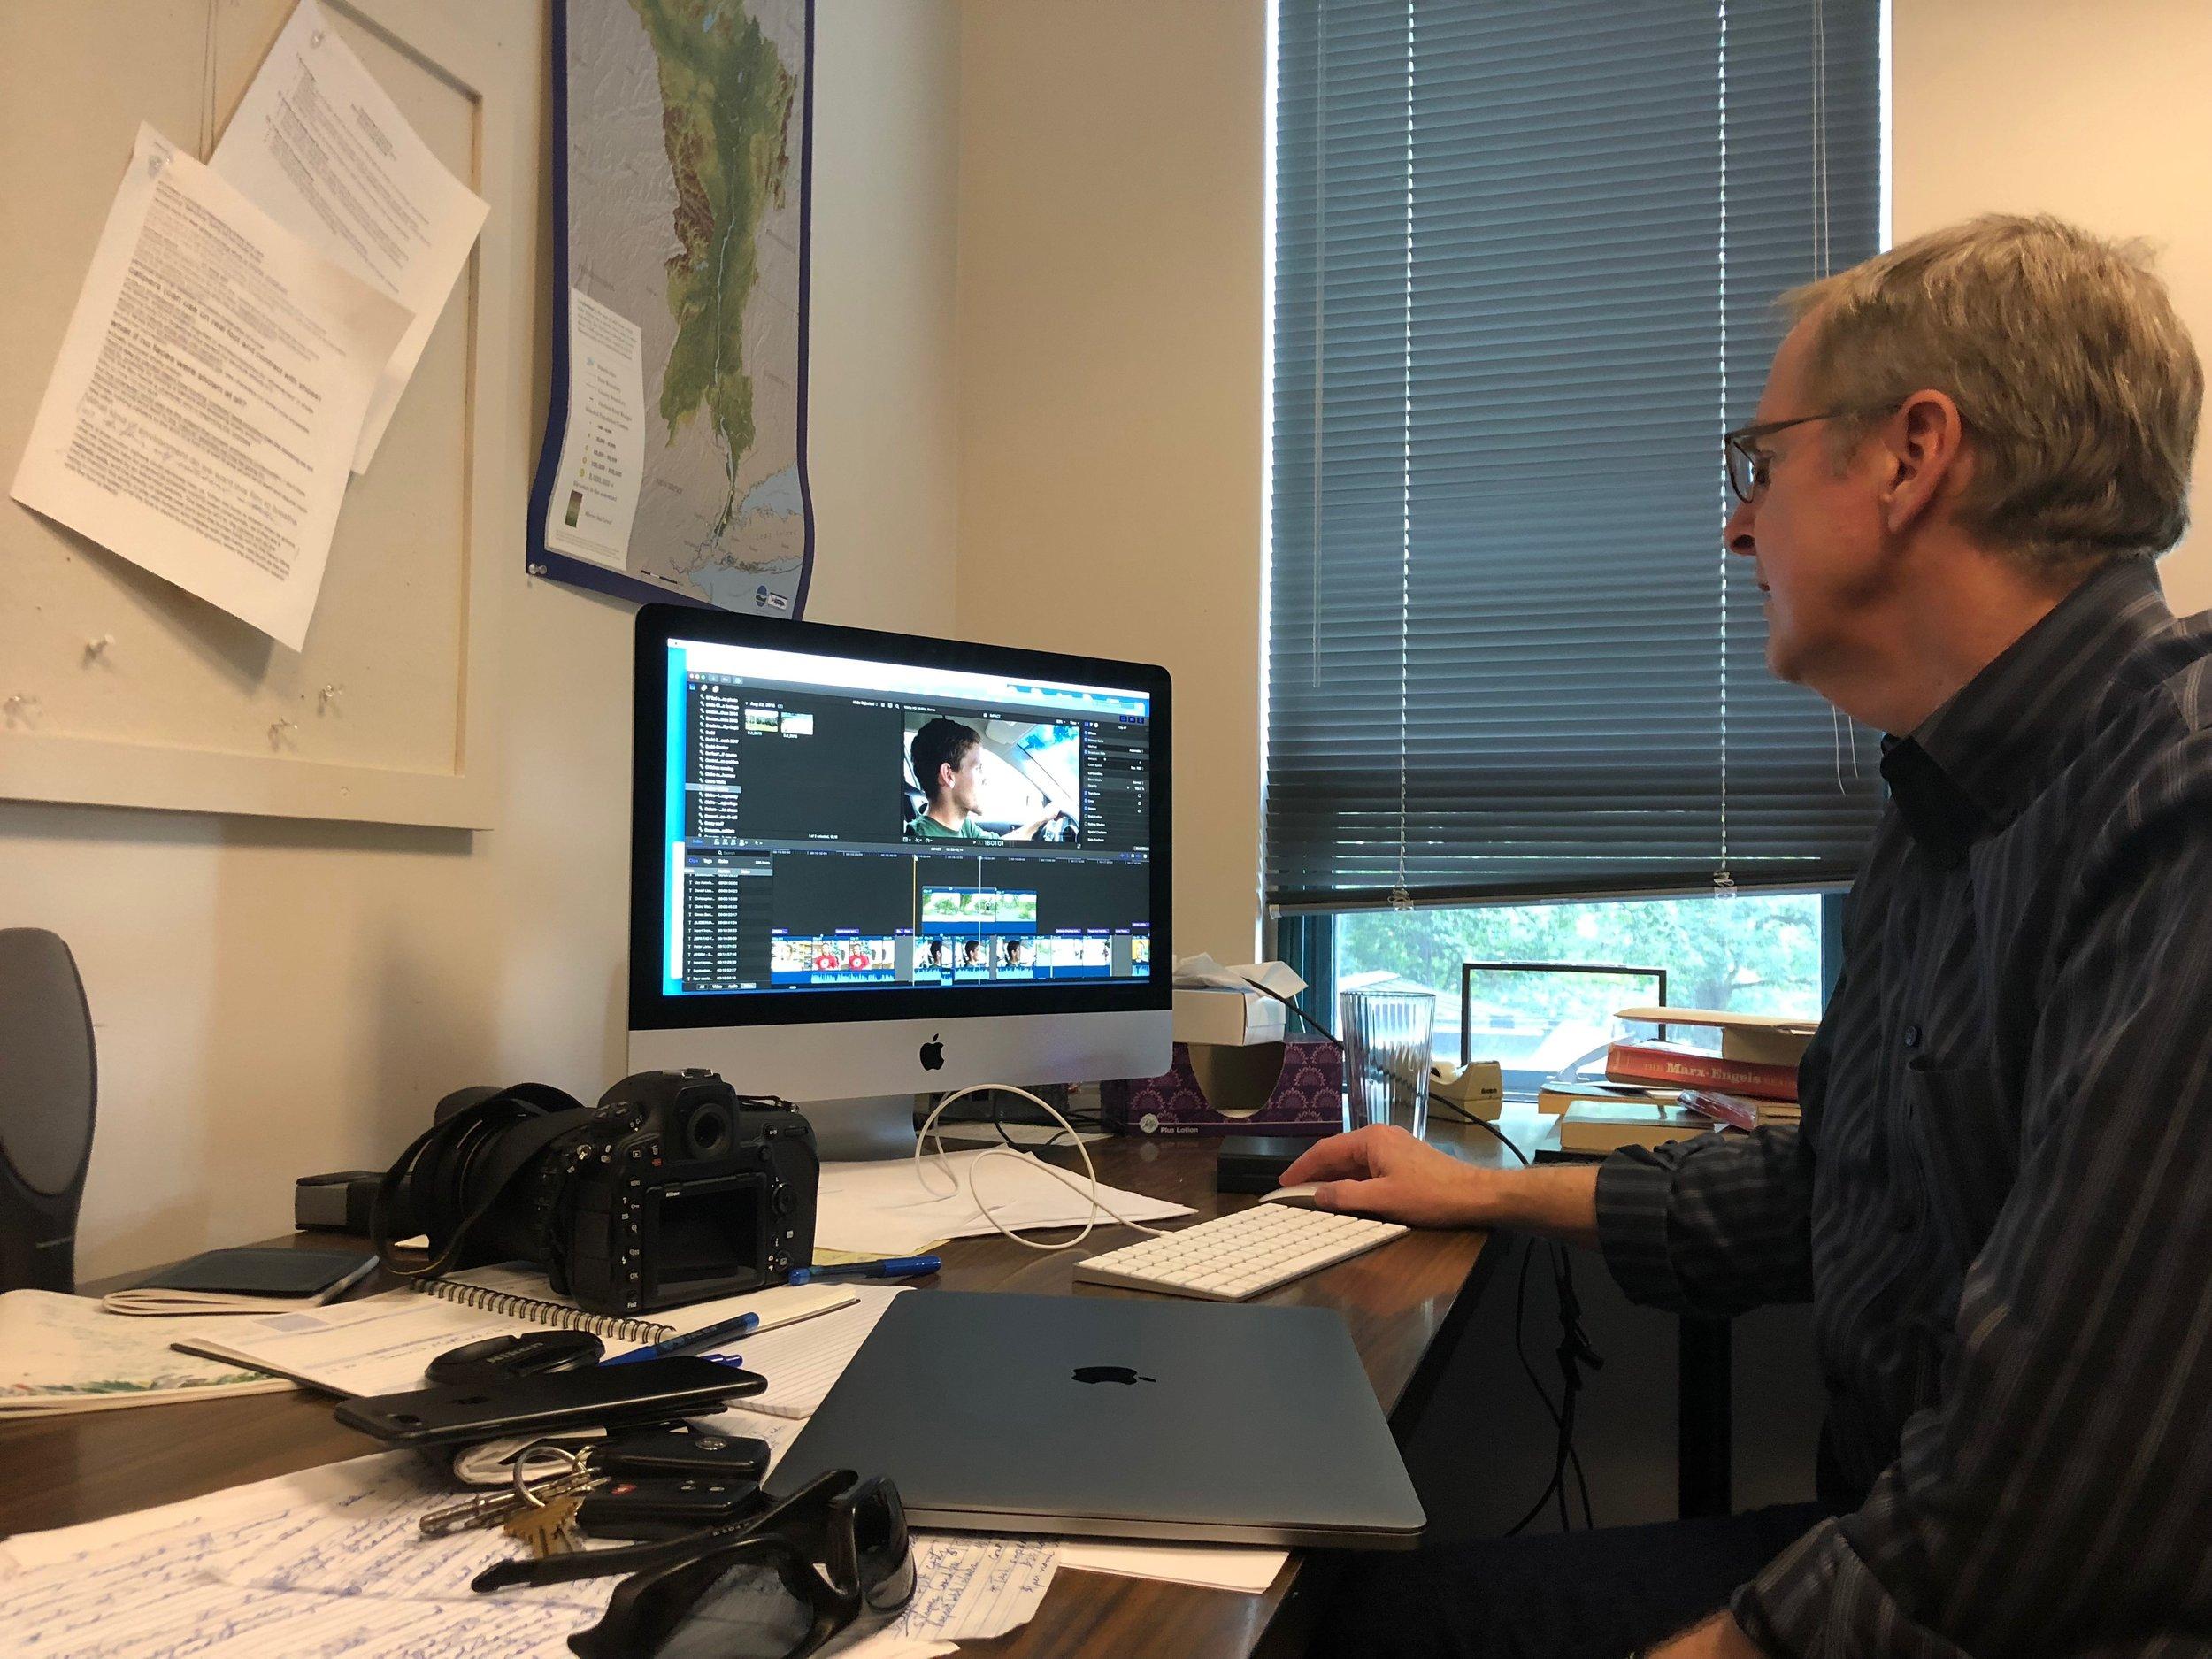 Professor Scarce editing 'Impact' at his desk.